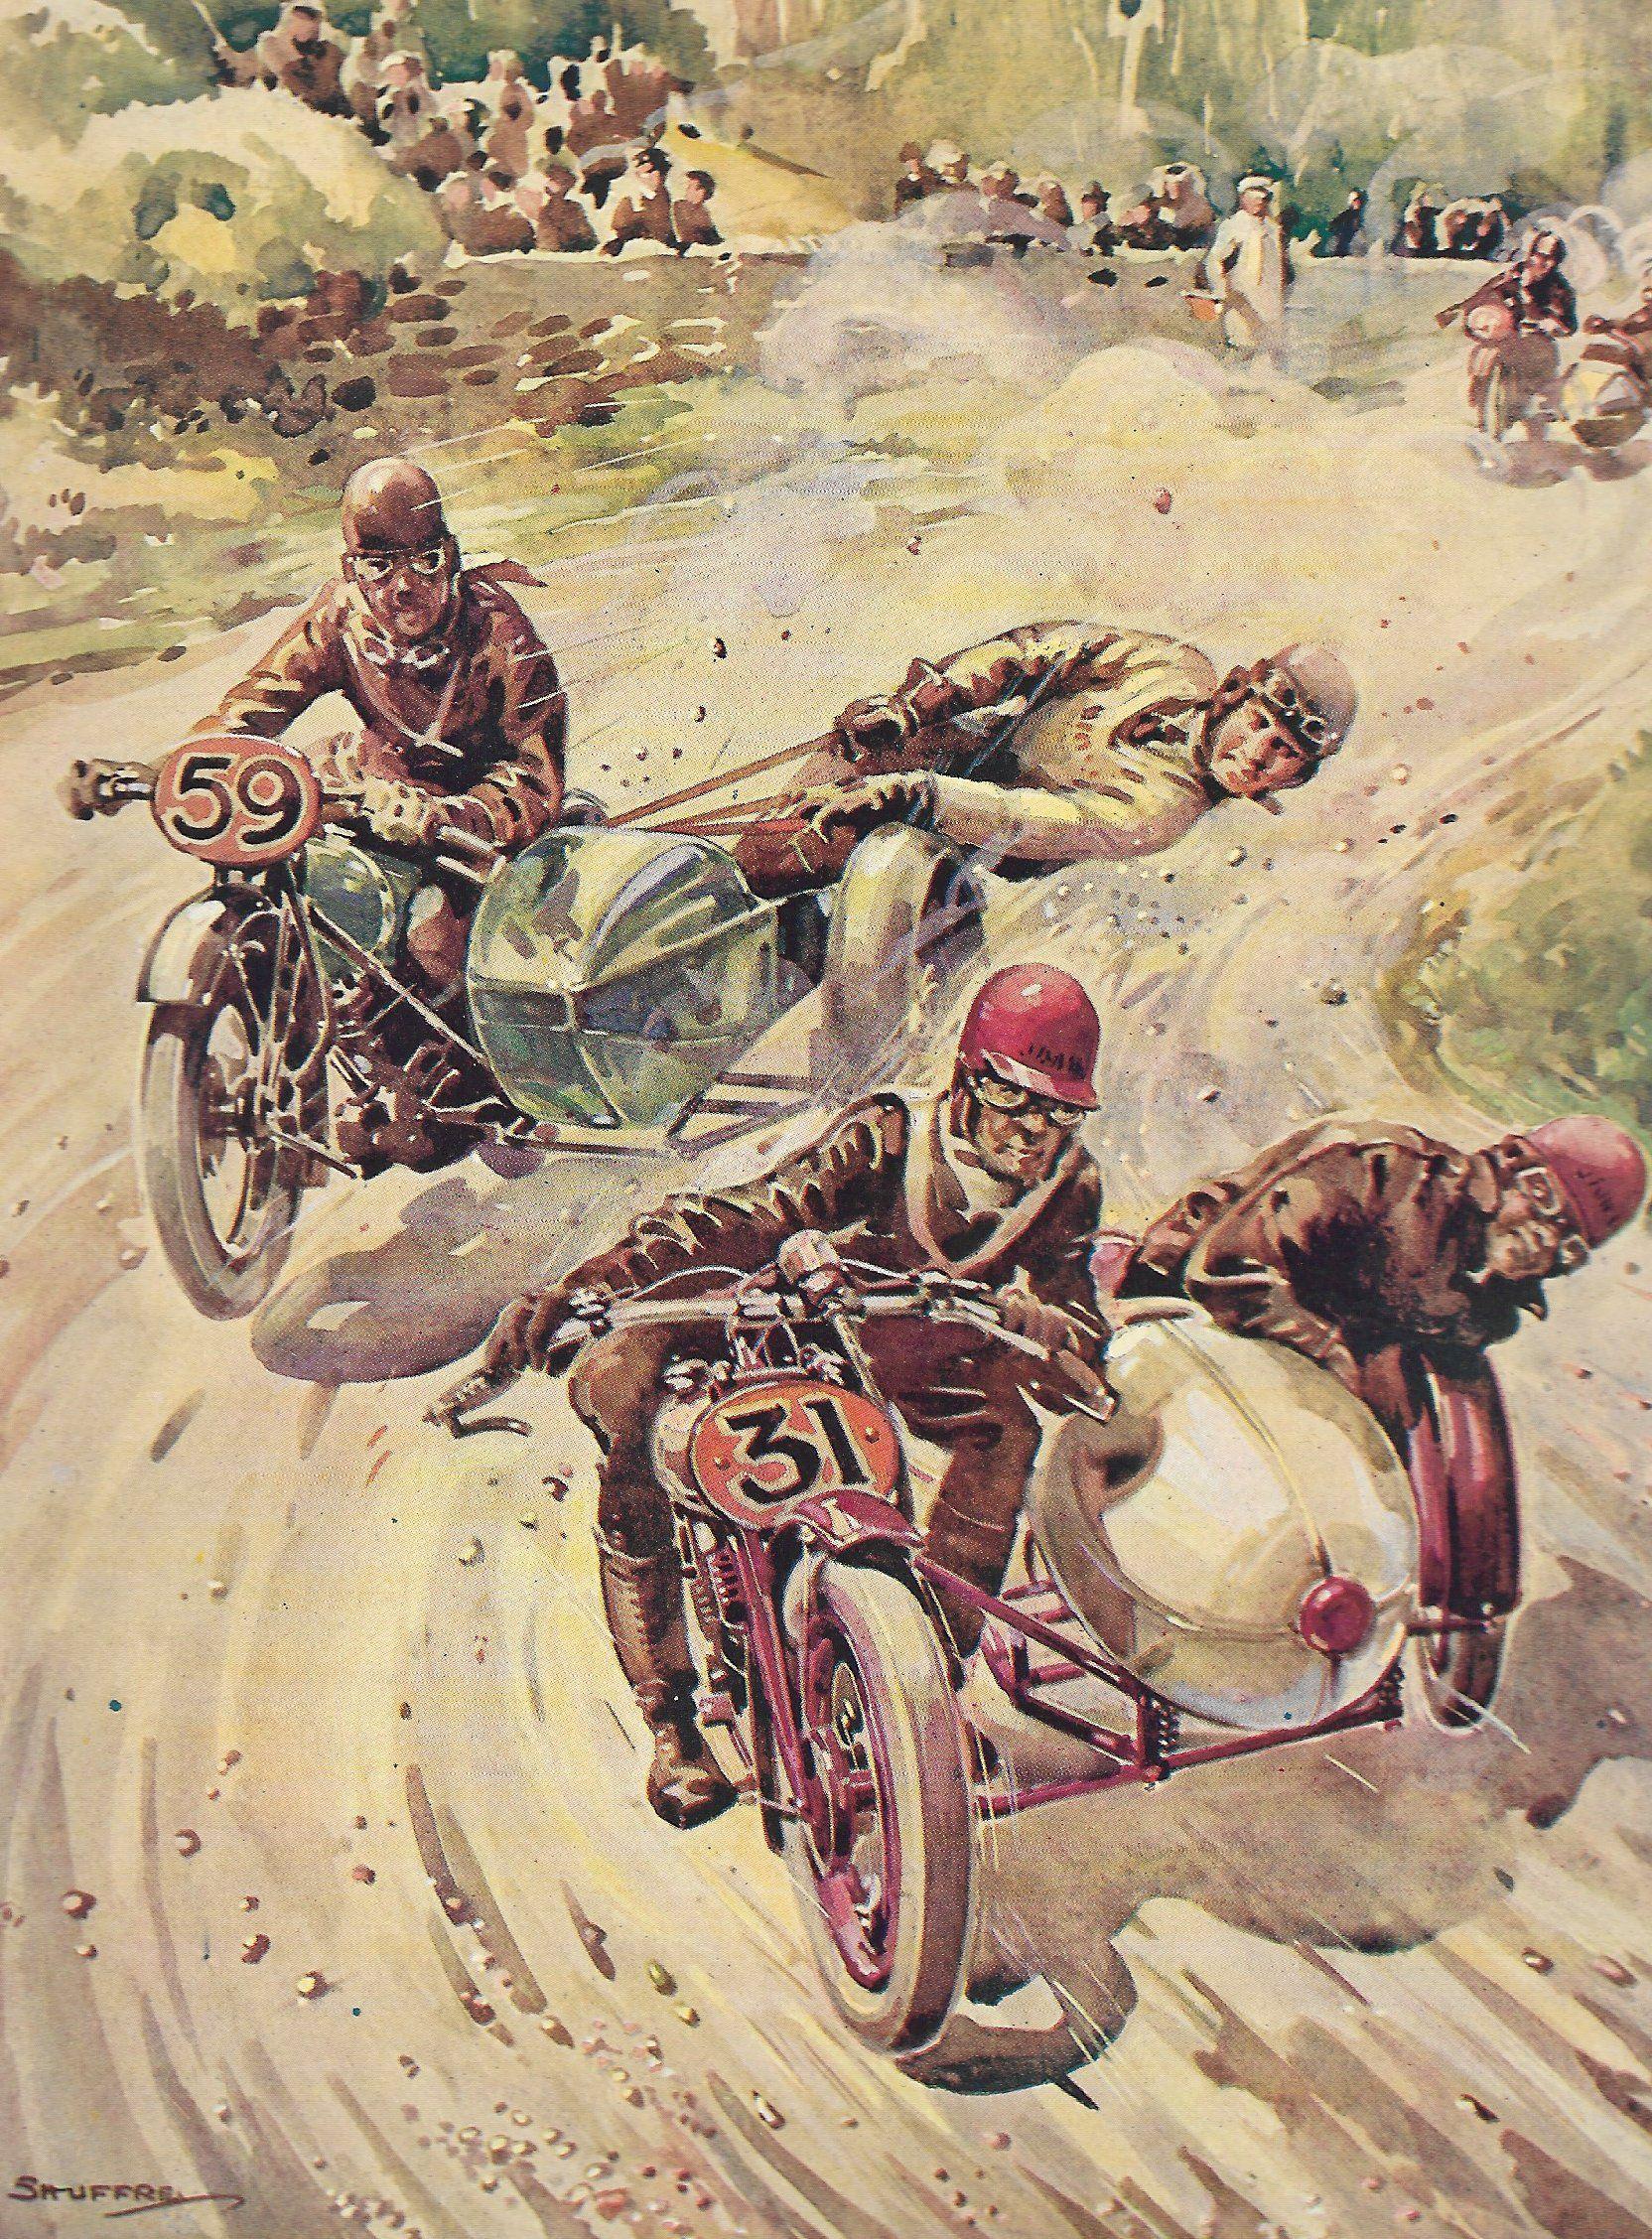 1920s Original Motorbike And Sidecar Vintage Print Motorcycle And